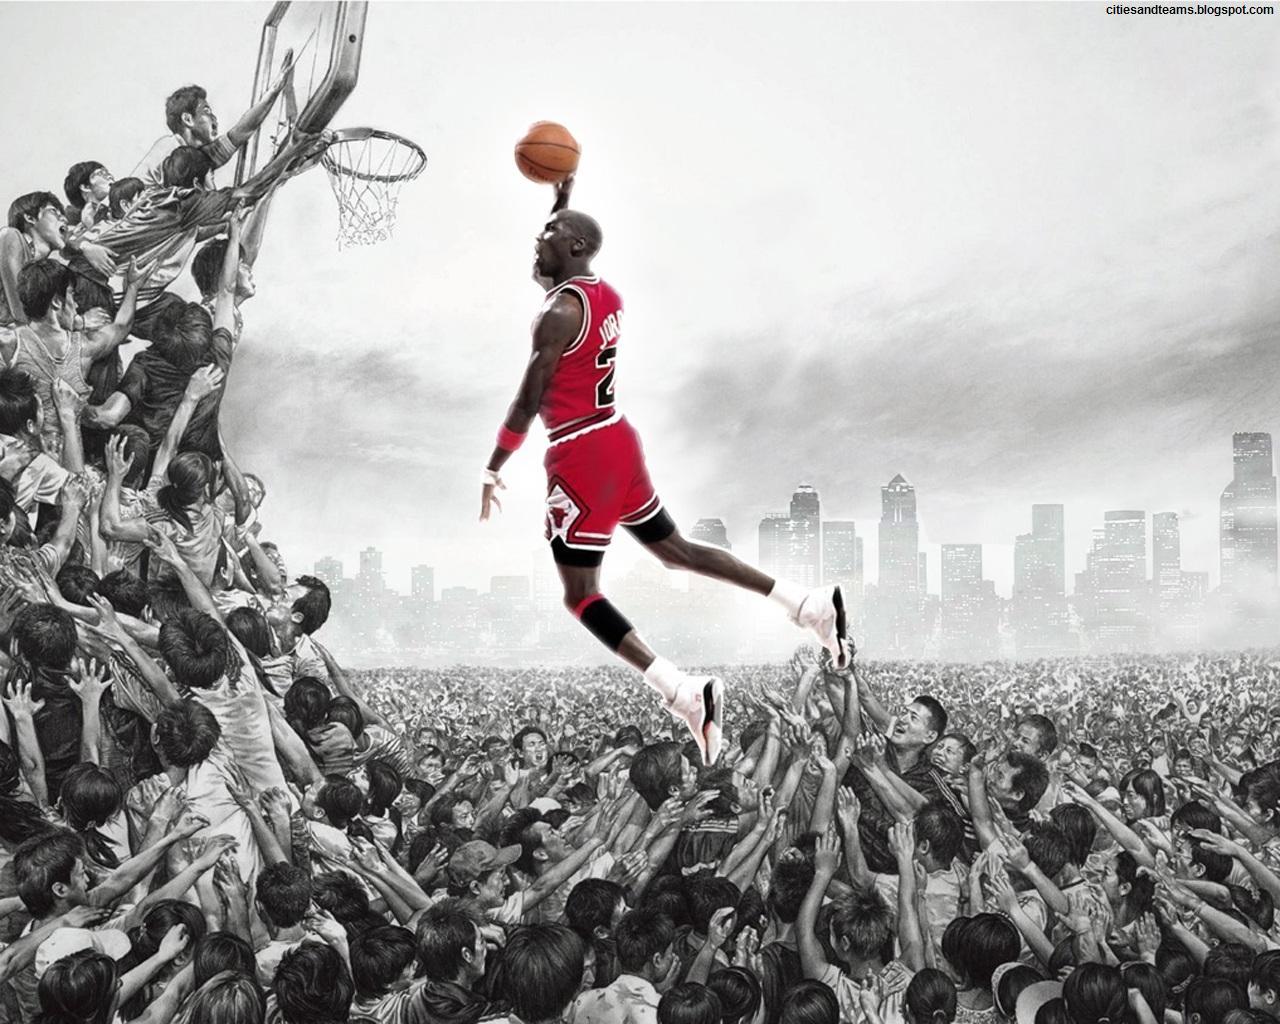 michael jordan american legend basketballer air love hd